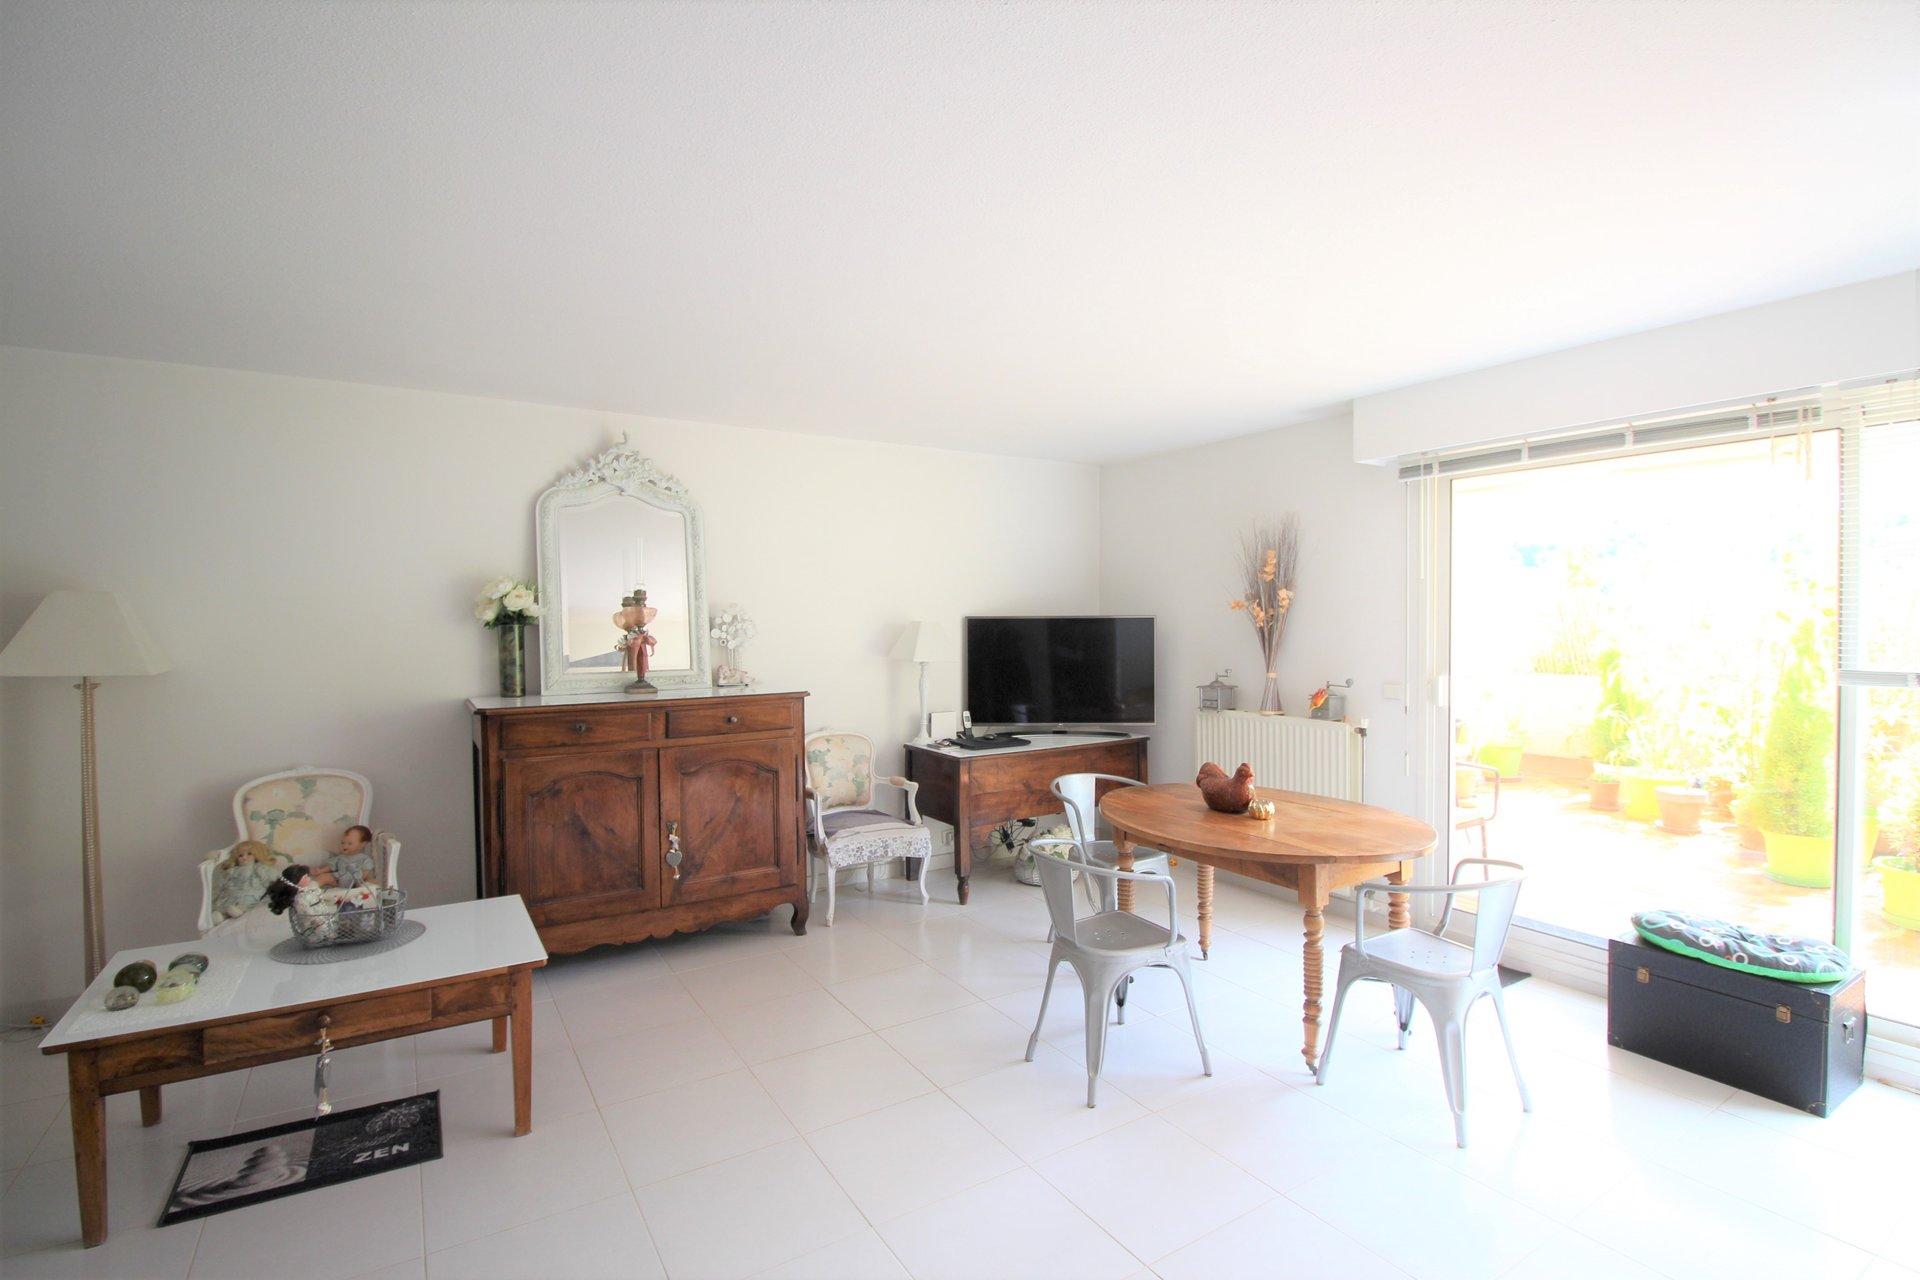 Mandelieu, Domaine de Bellevue, 2 bedrooms apartment, terrace, parkings.